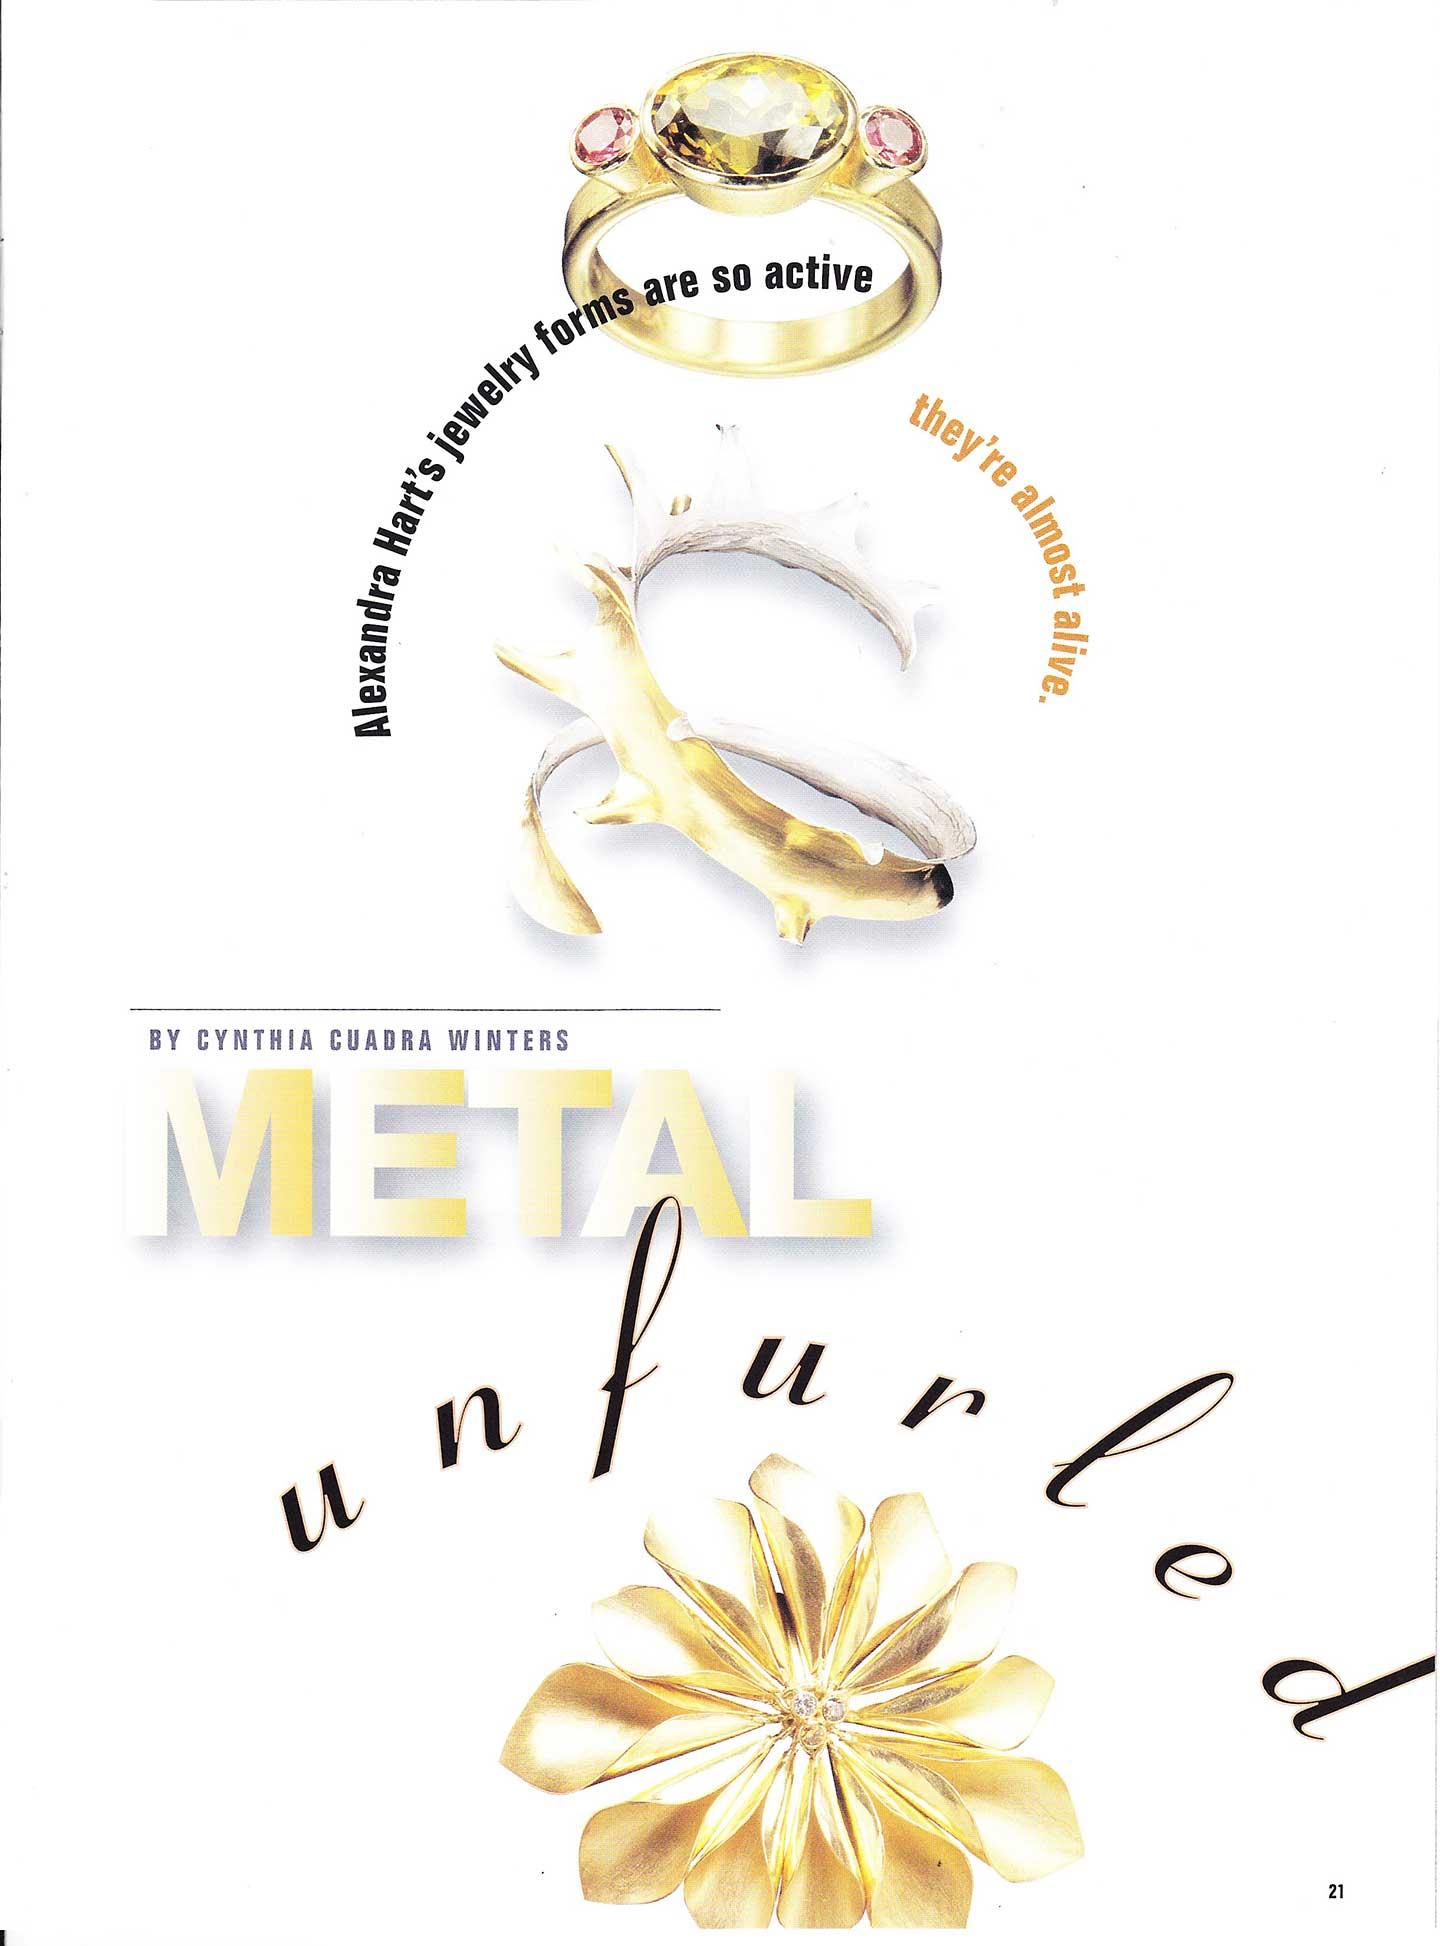 LapidaryJournal-Nov2003-82